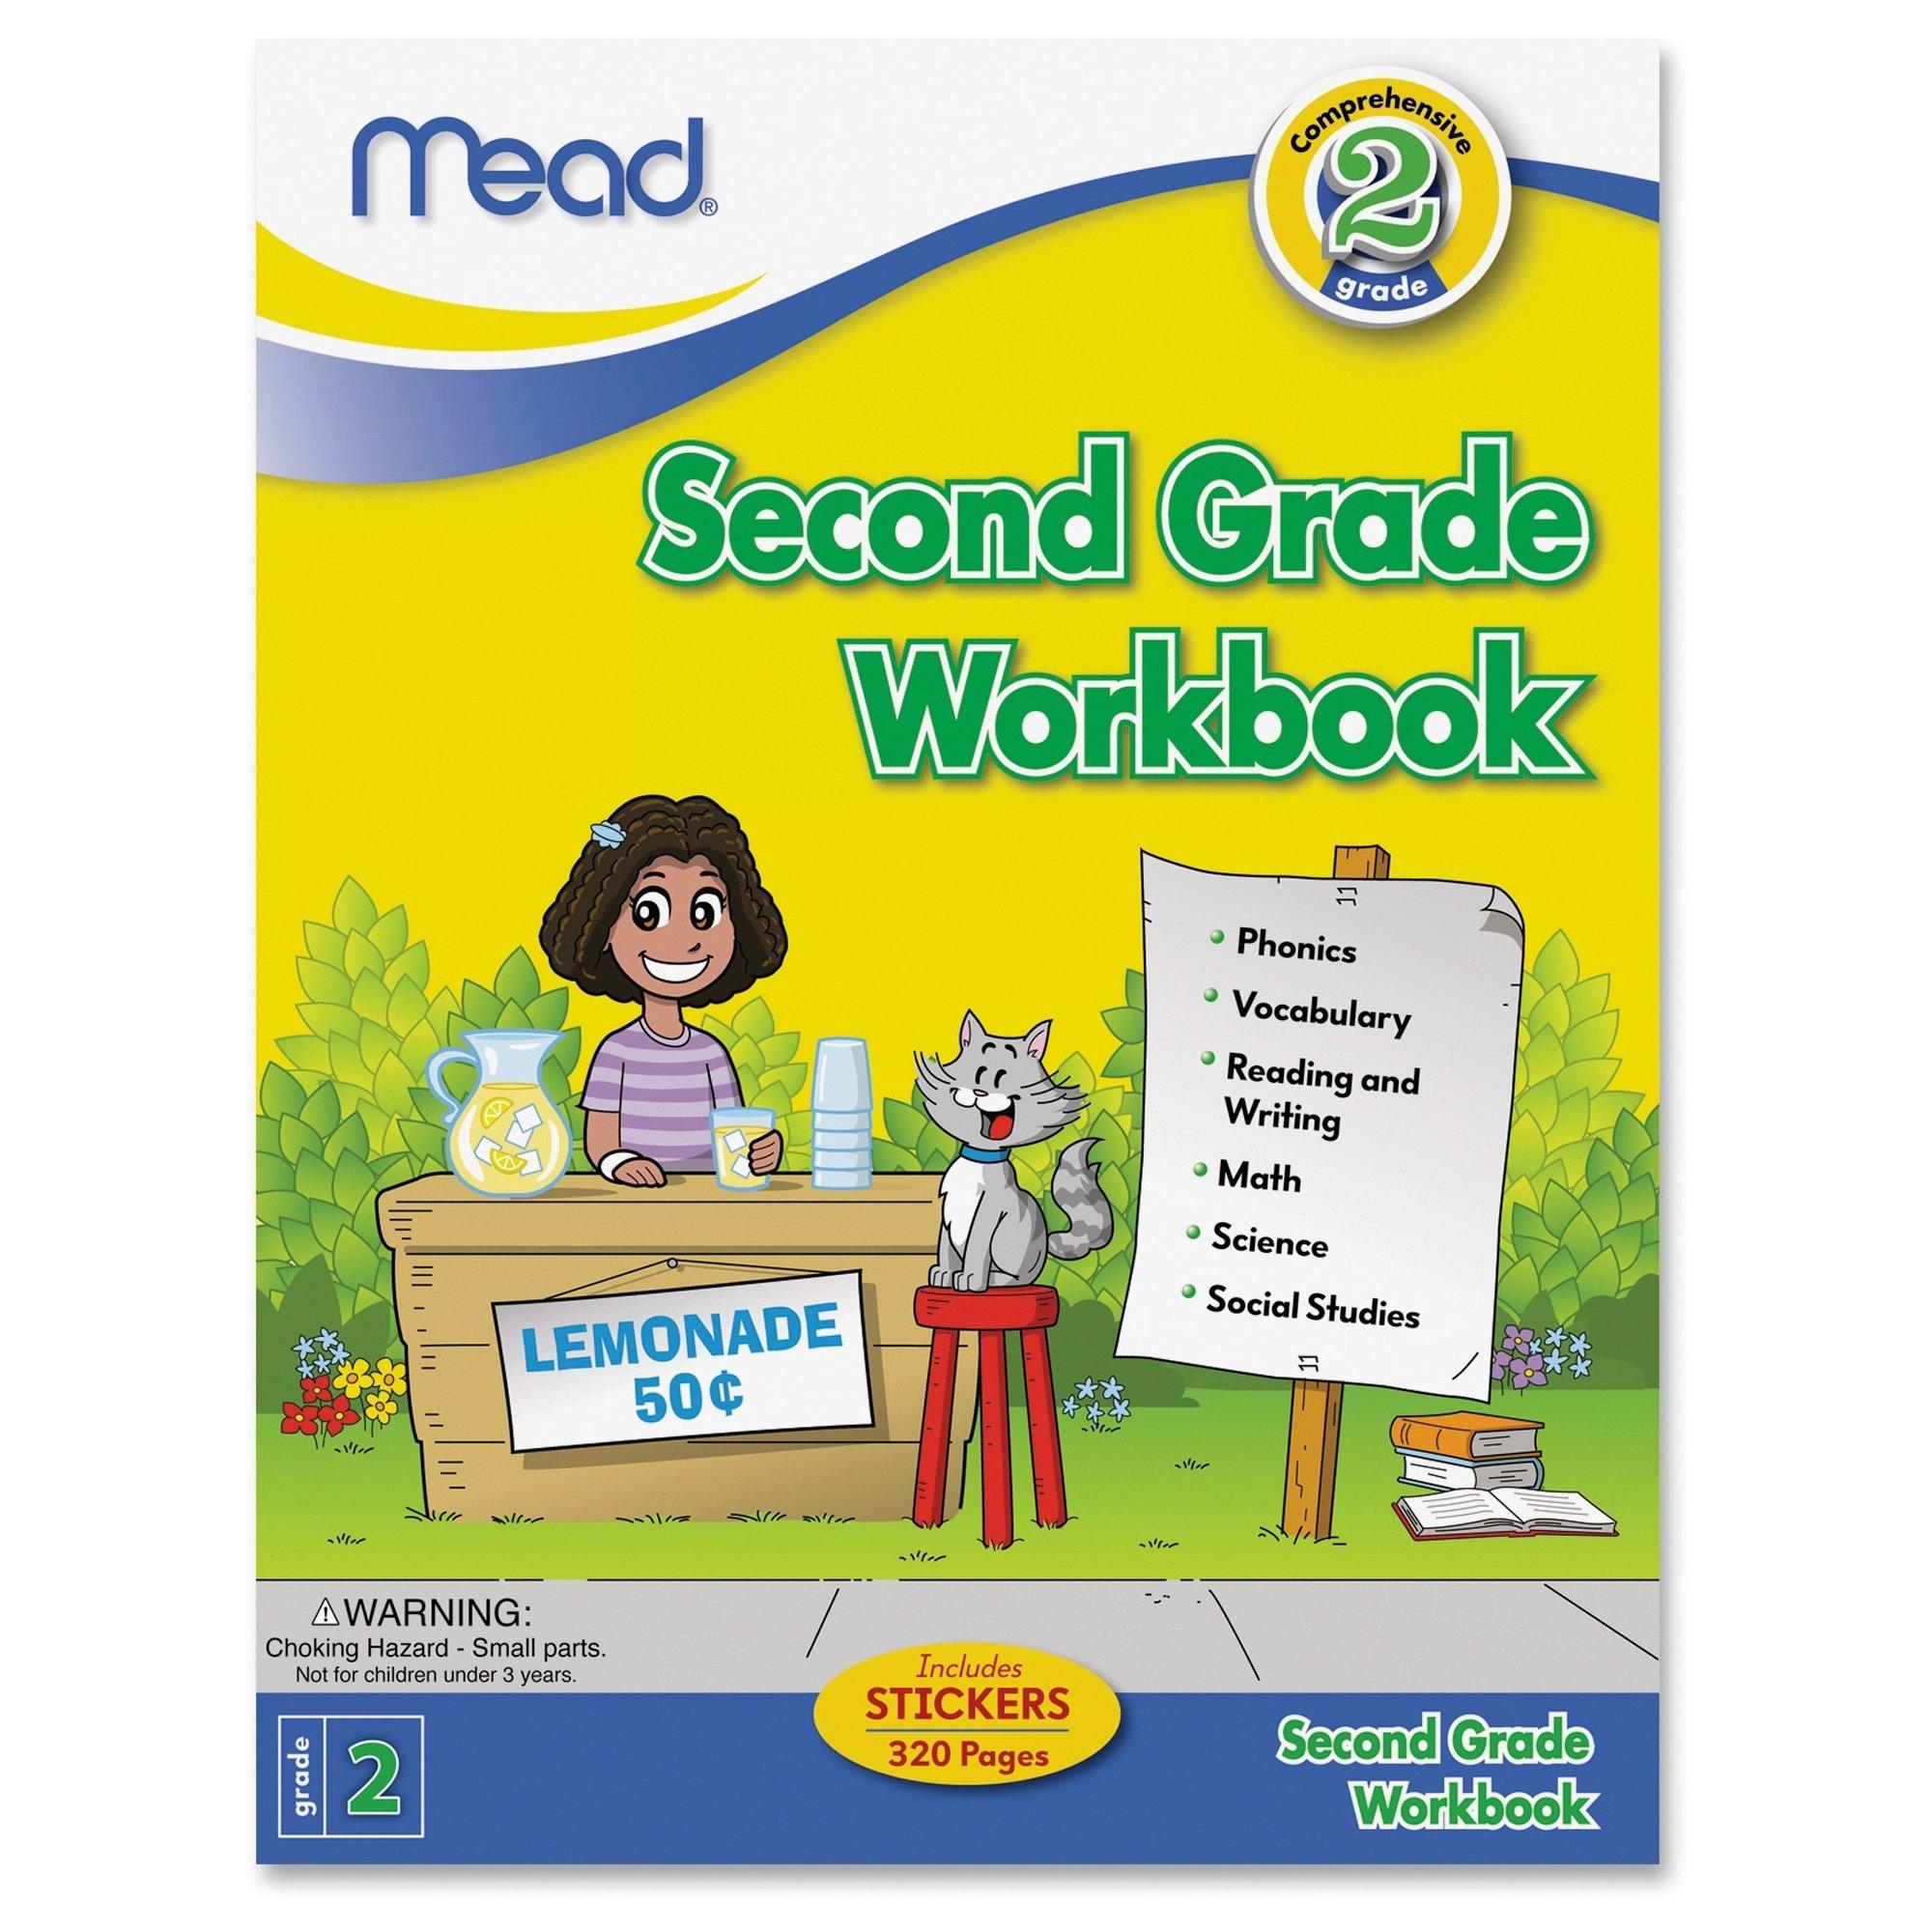 Mead Second Grade Workbook (48220)